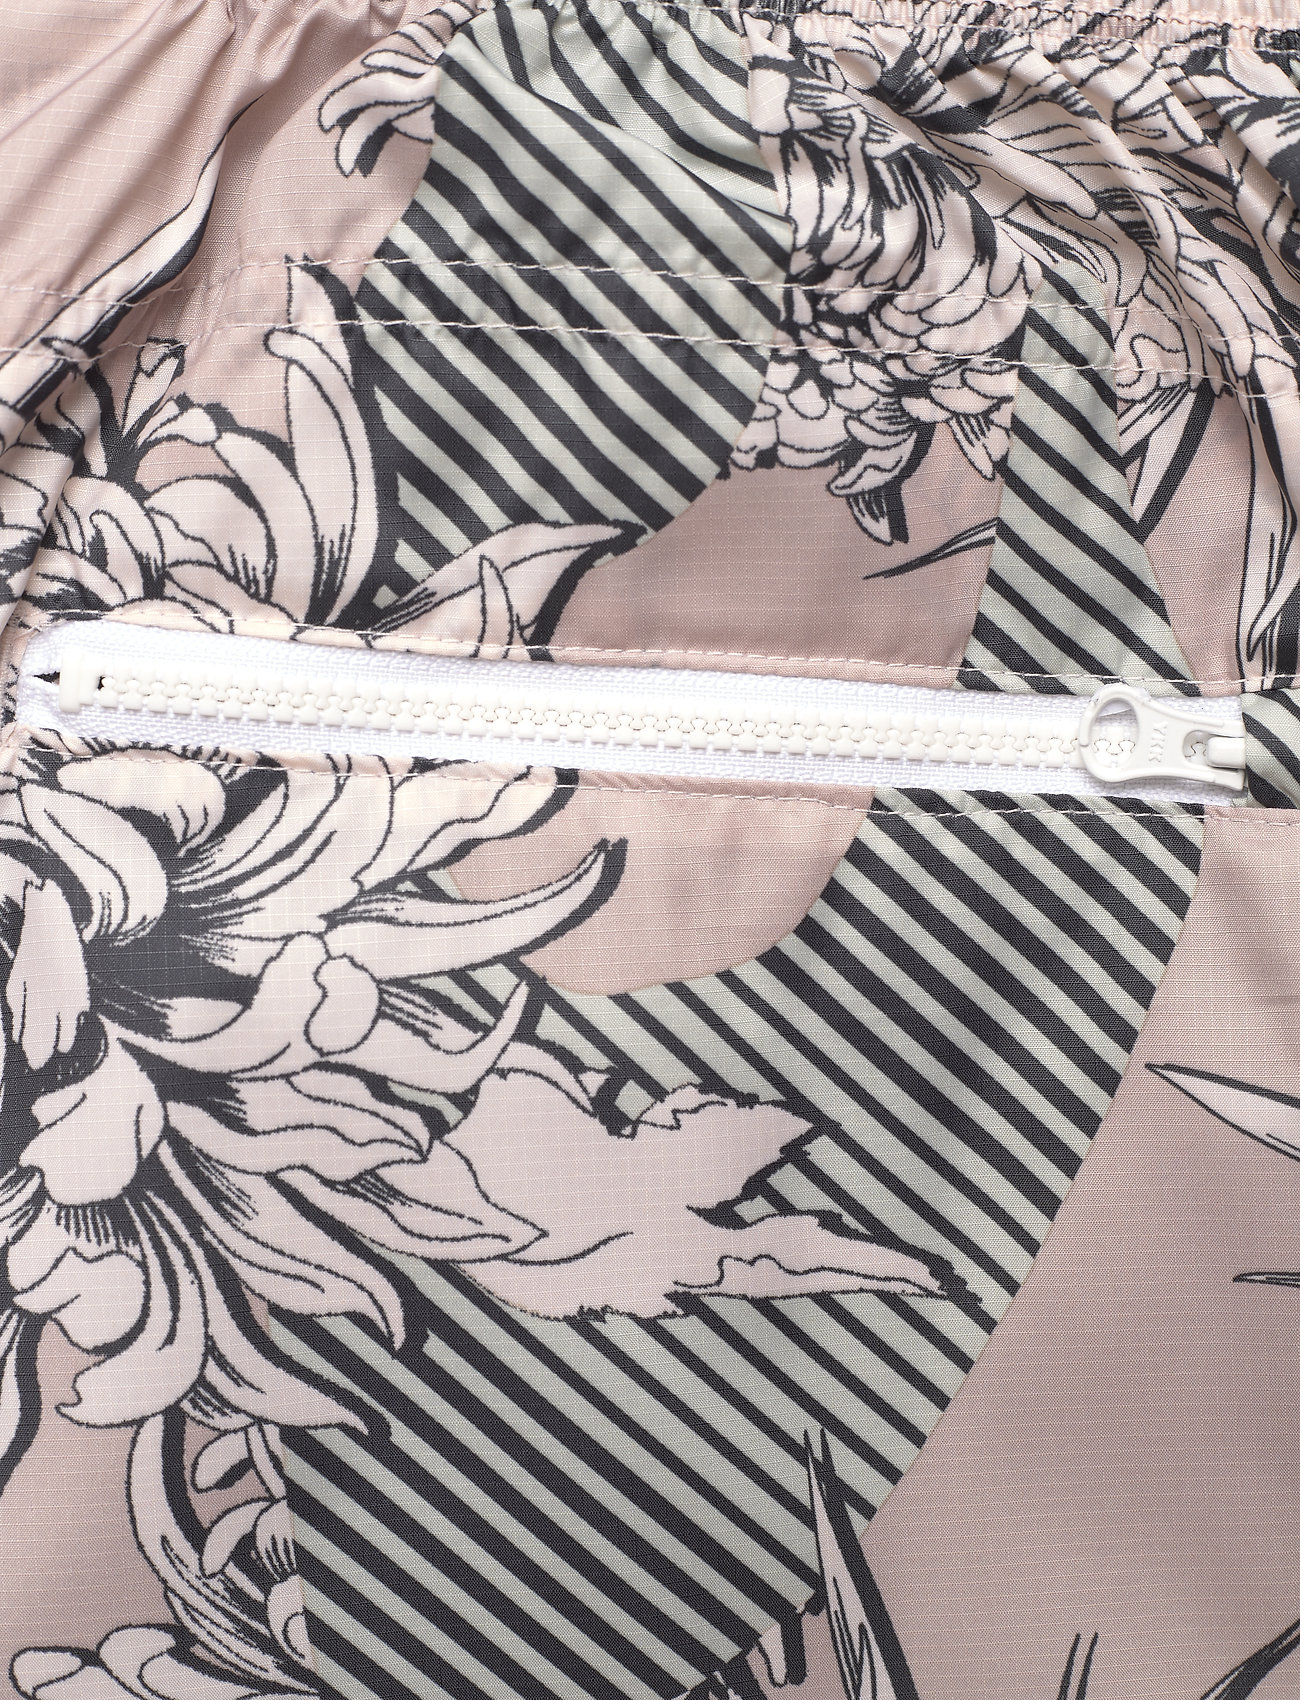 adidas by Stella McCartney - Future Playground Woven Pants W - sports pants - pnktin/talc/pearos/bl - 4